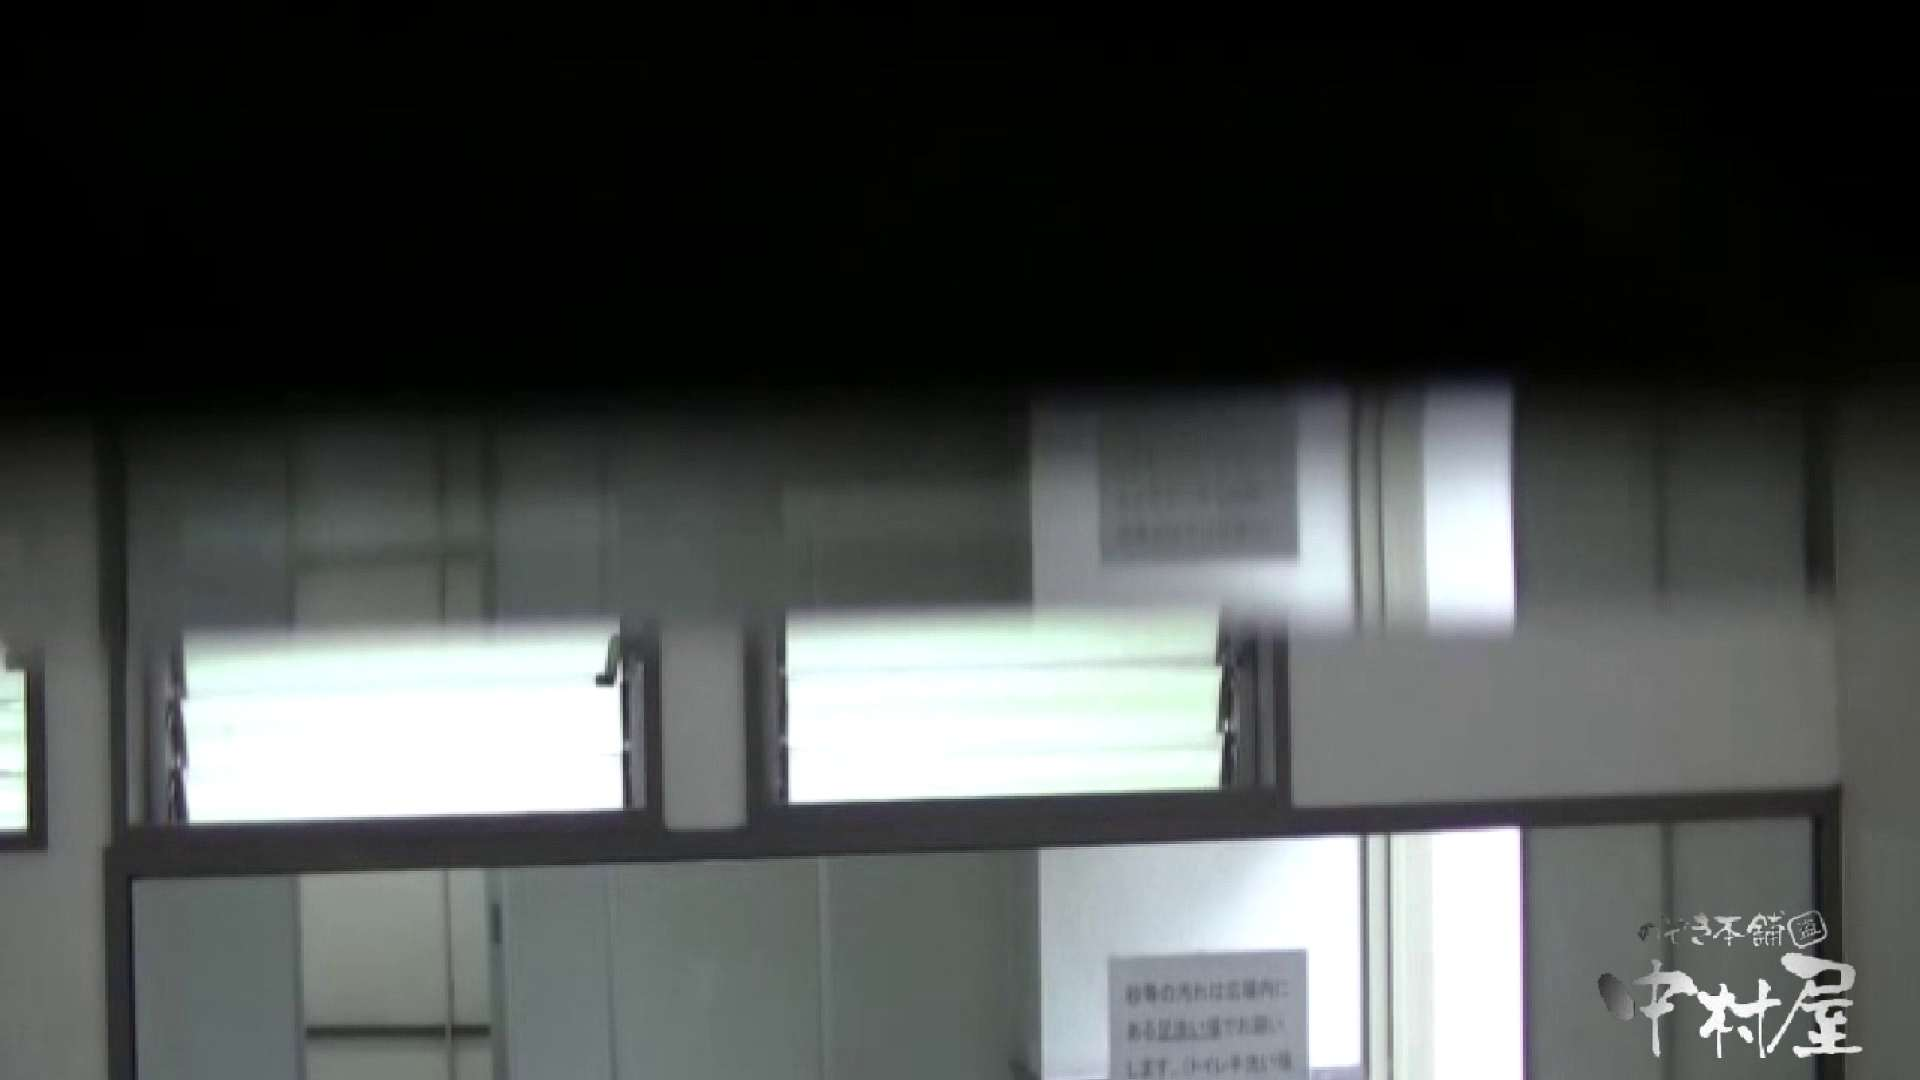 VIP配信している雅さんの独断と偏見で集めたVIP限定 動画集Vol.1一部公開 期間限定  53画像 44